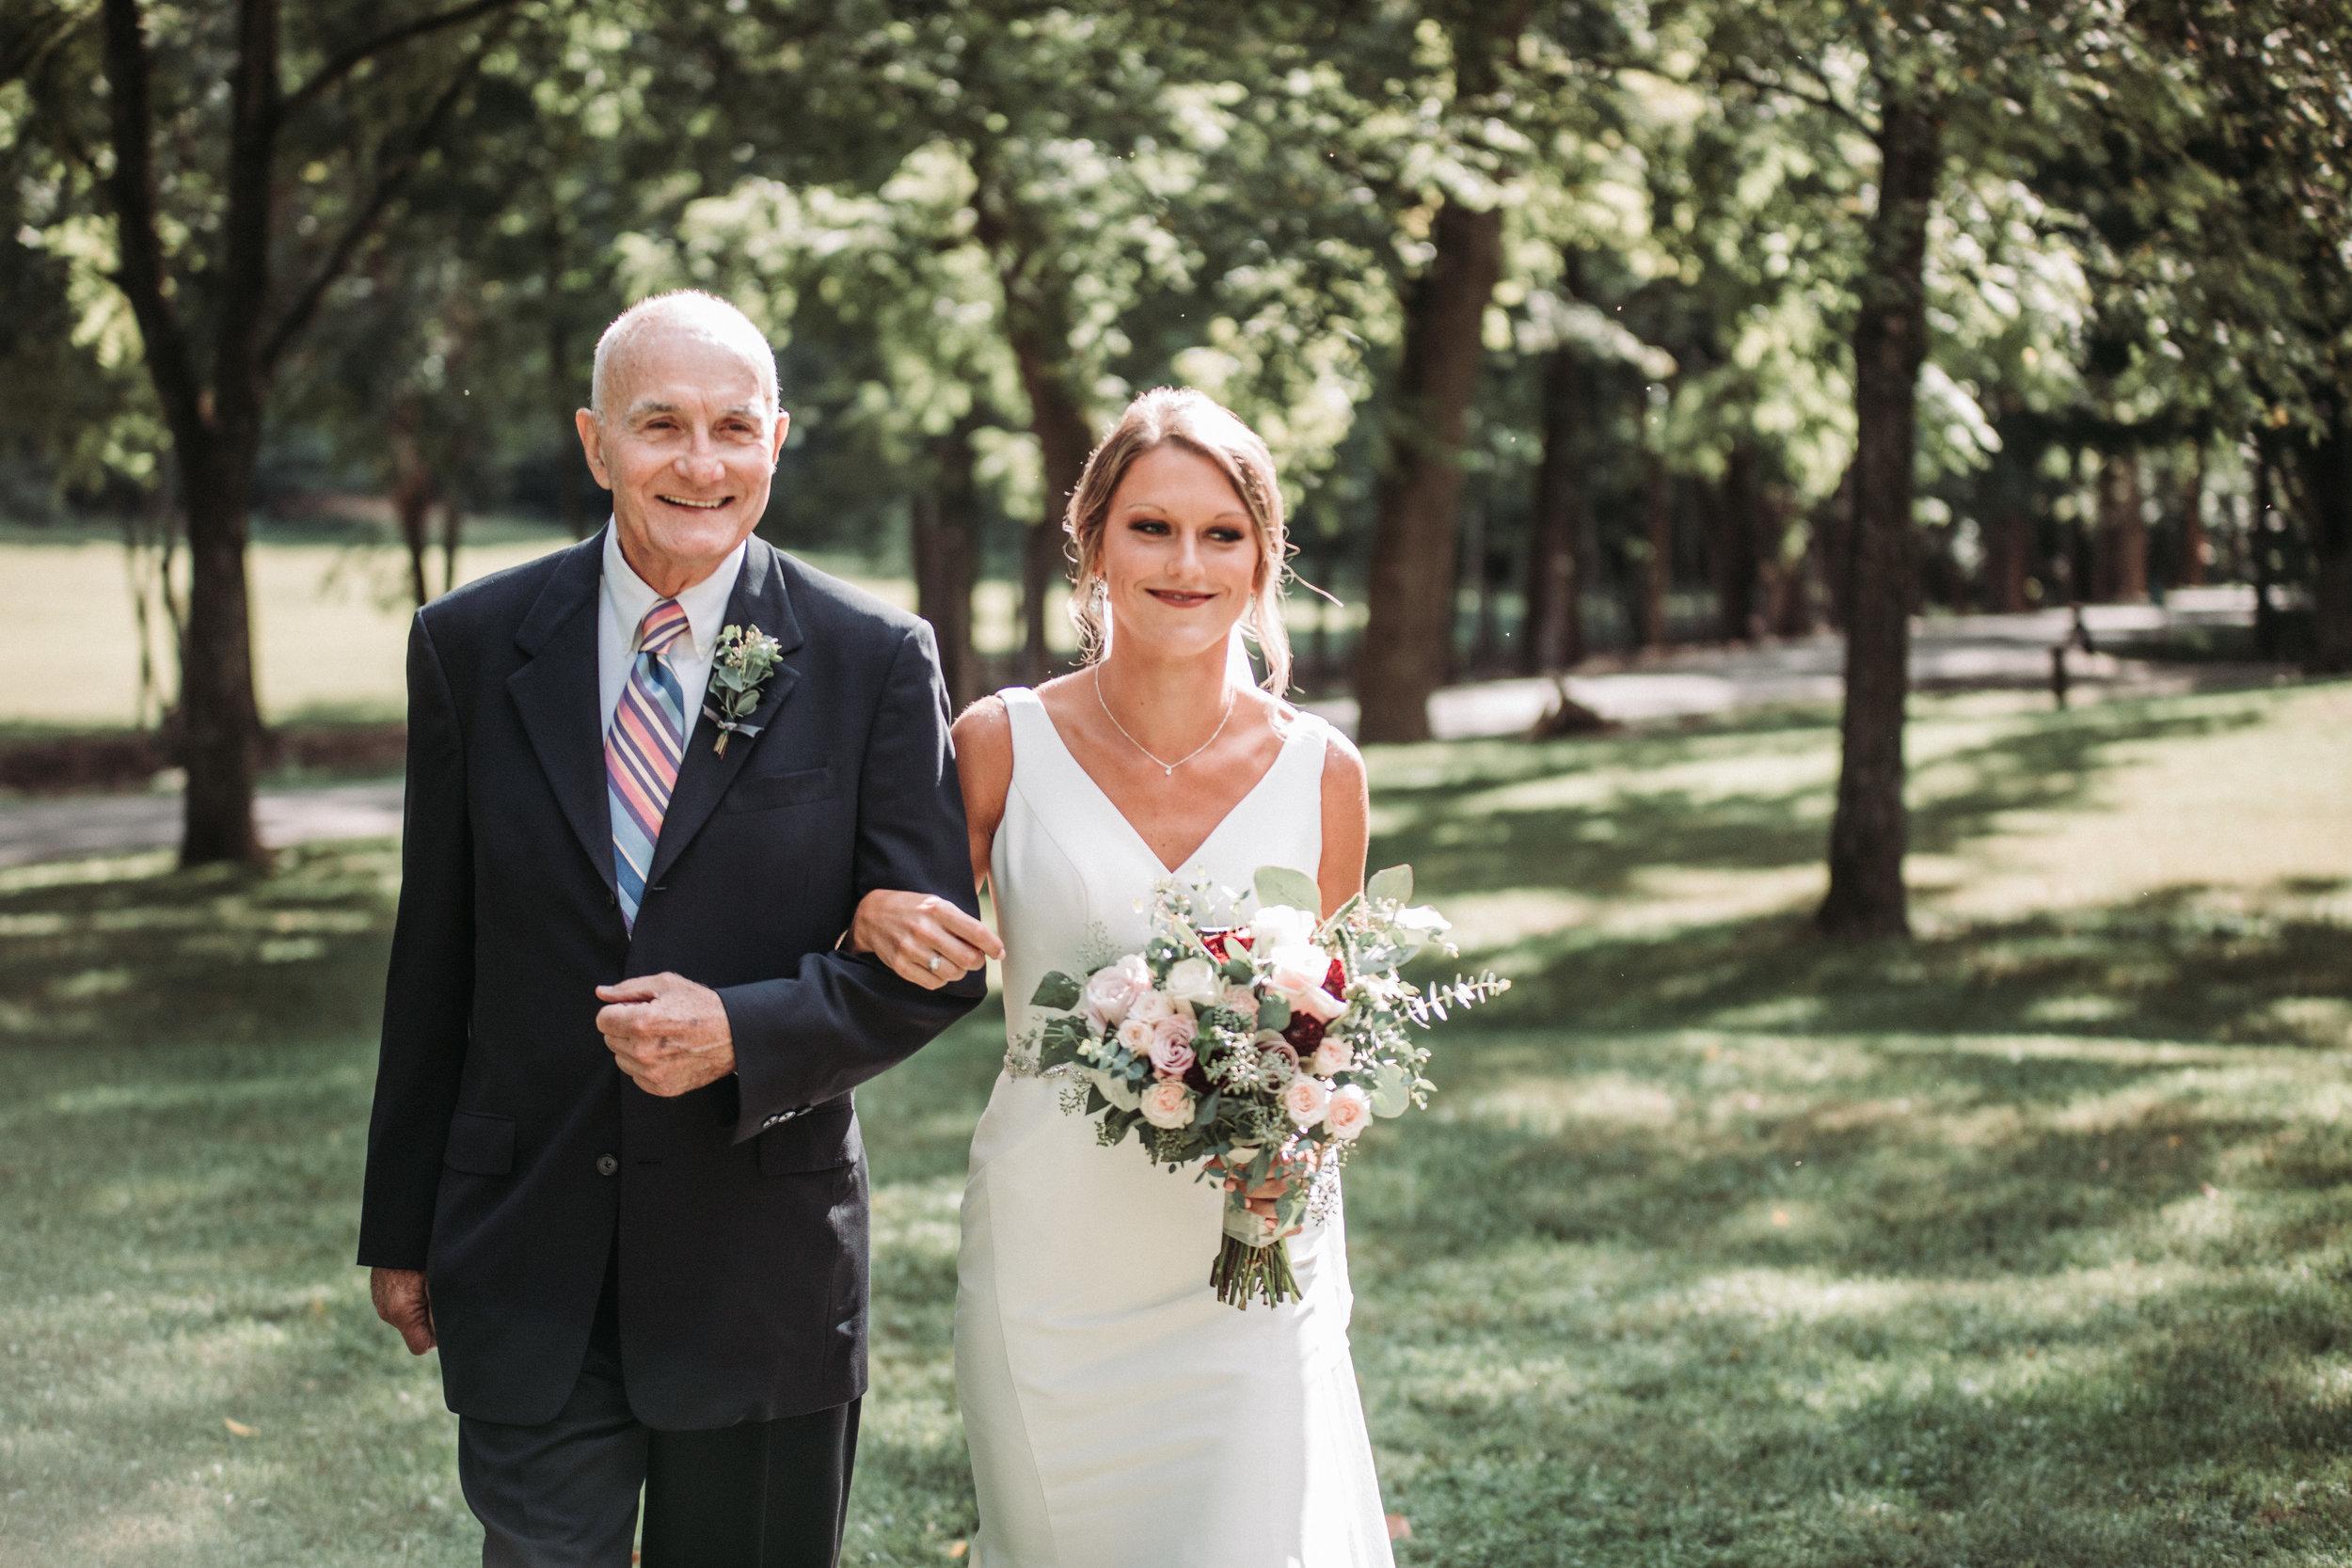 brown_county_fall_summer_wedding-60.jpg